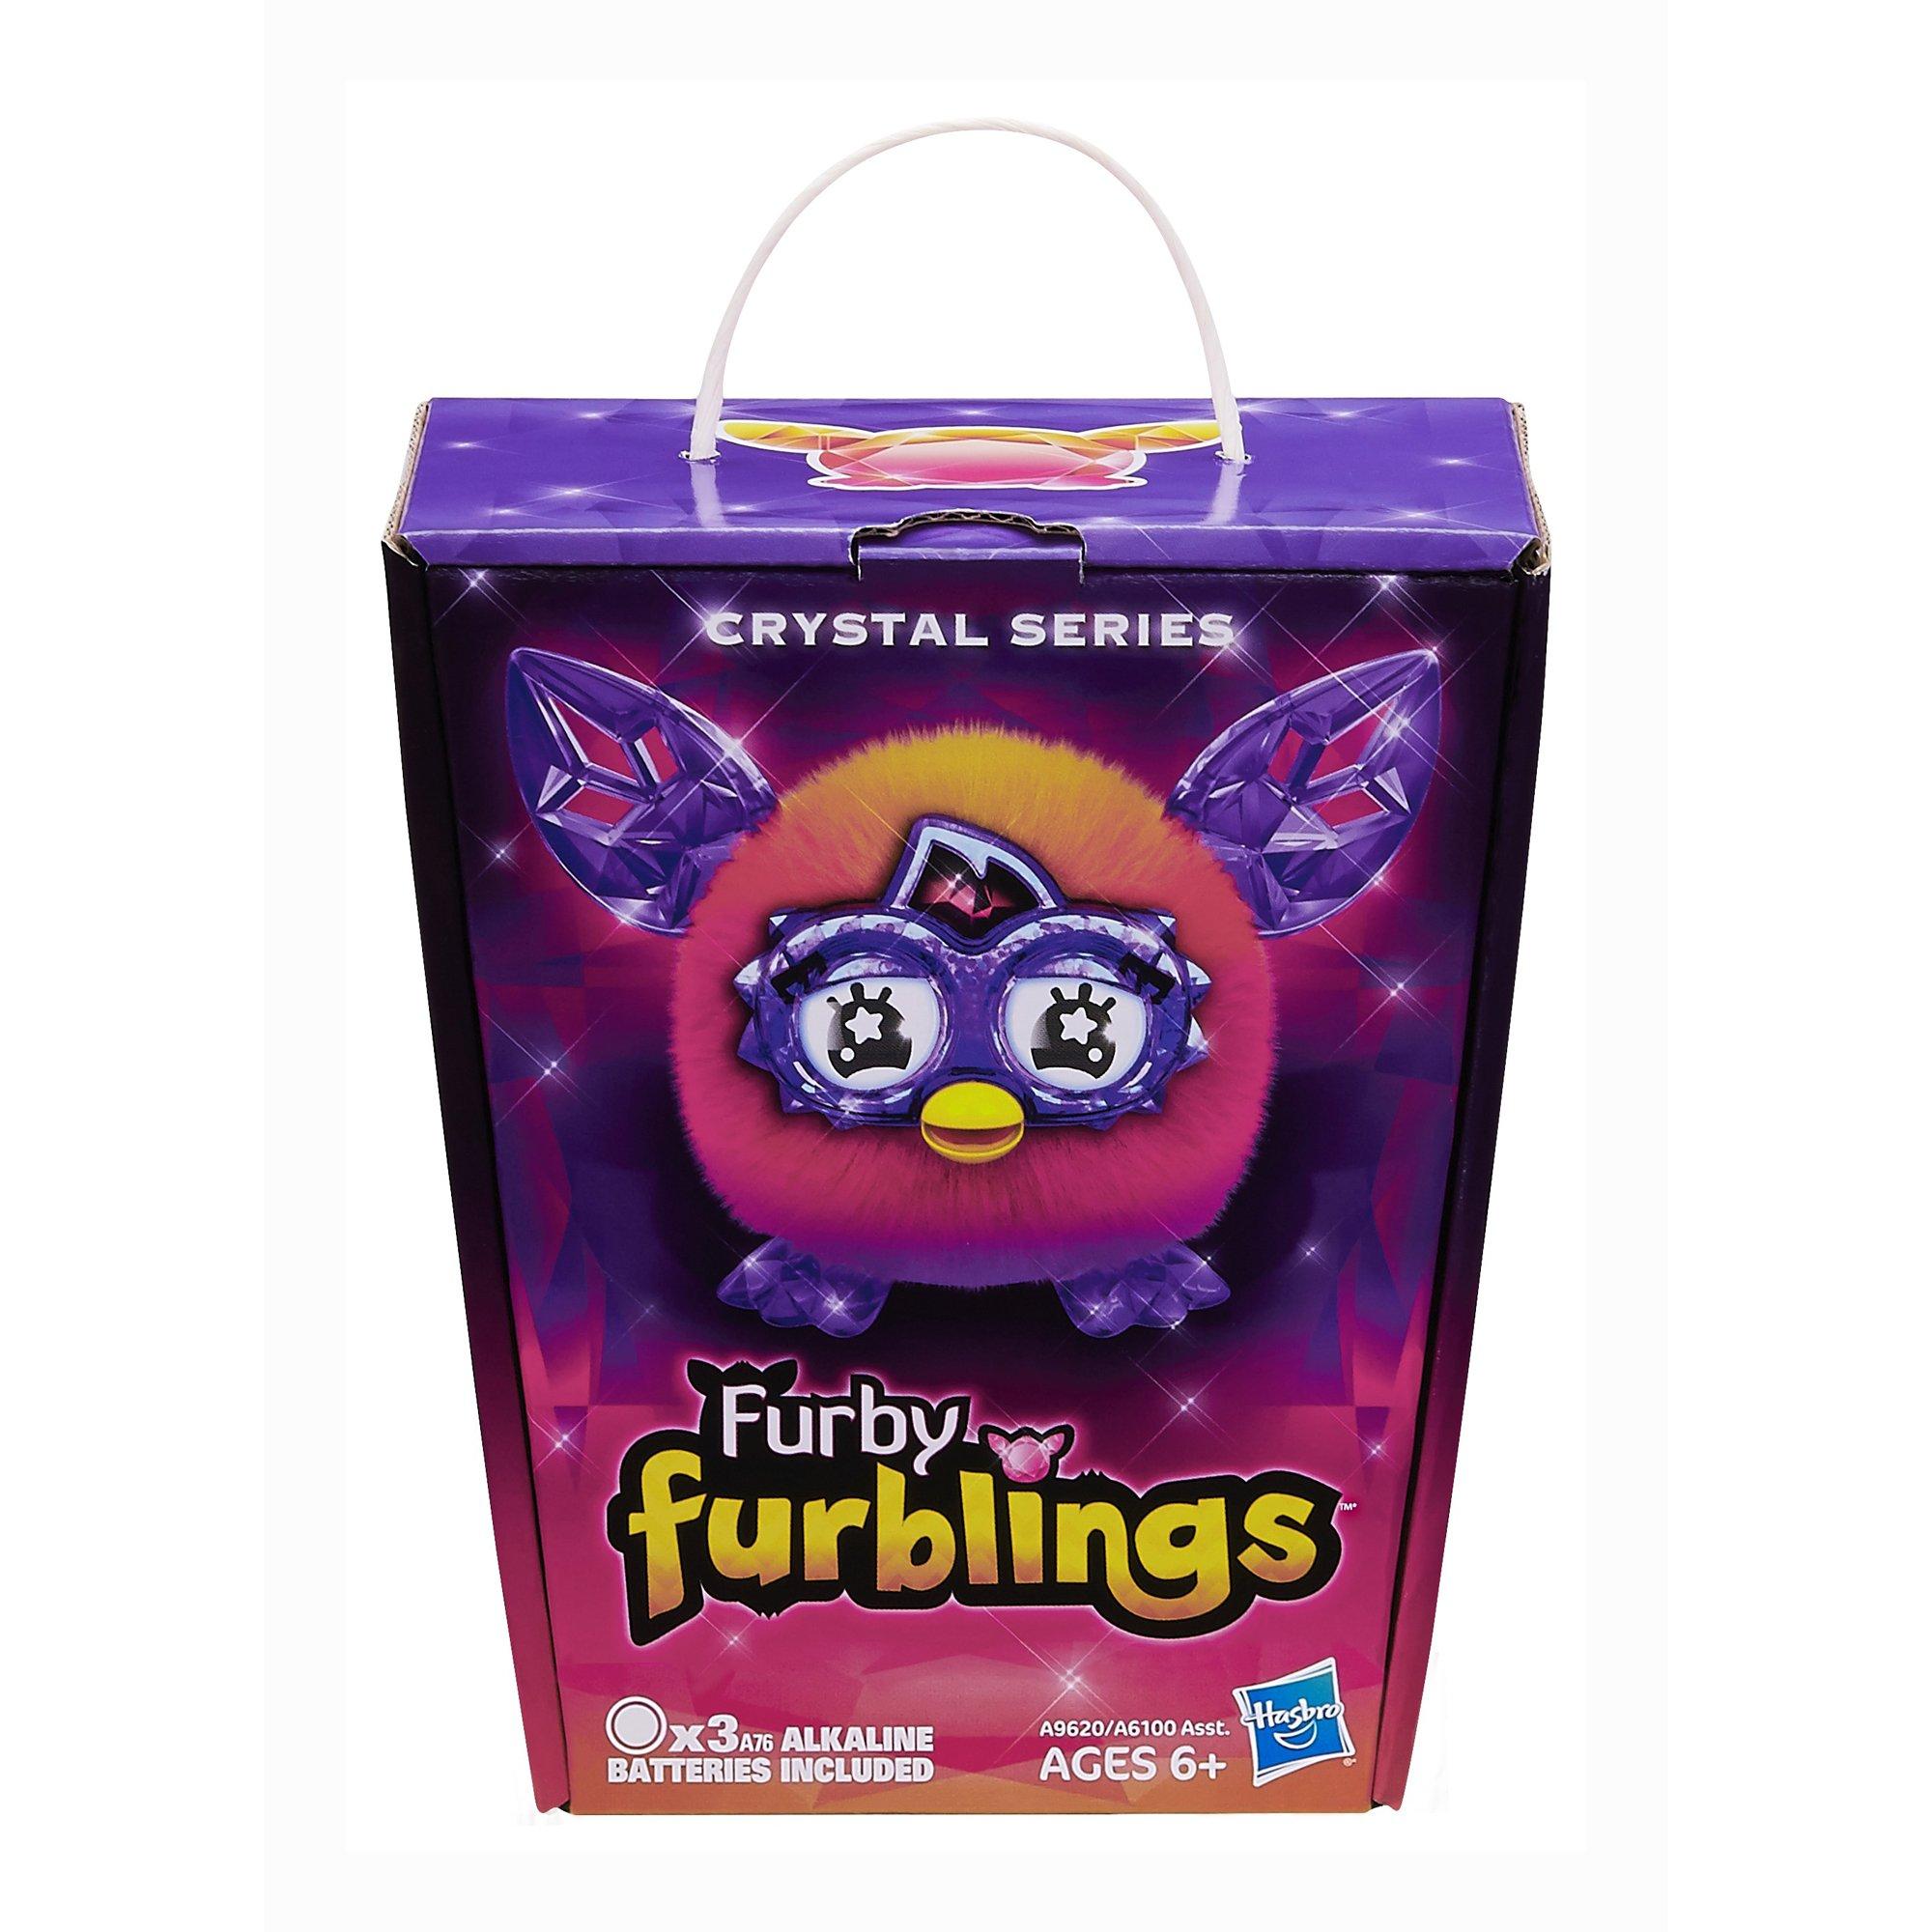 Furby Furblings Creature Plush, Orange/Pink by Furby (Image #2)